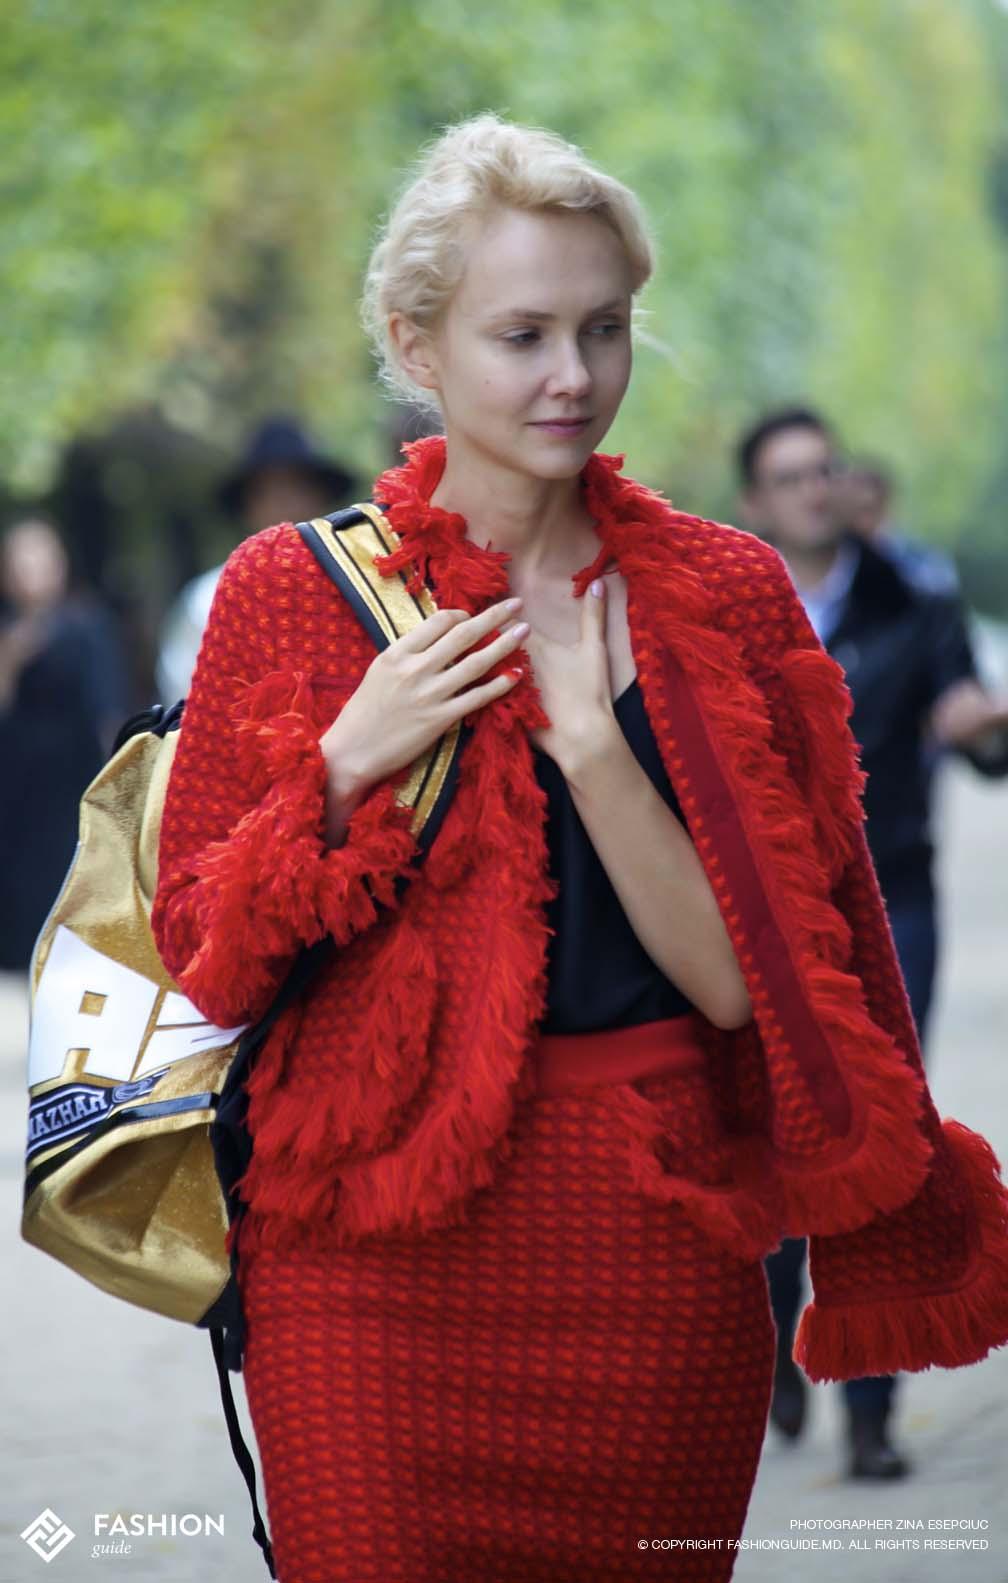 Street Style FG Paris Day 2 12